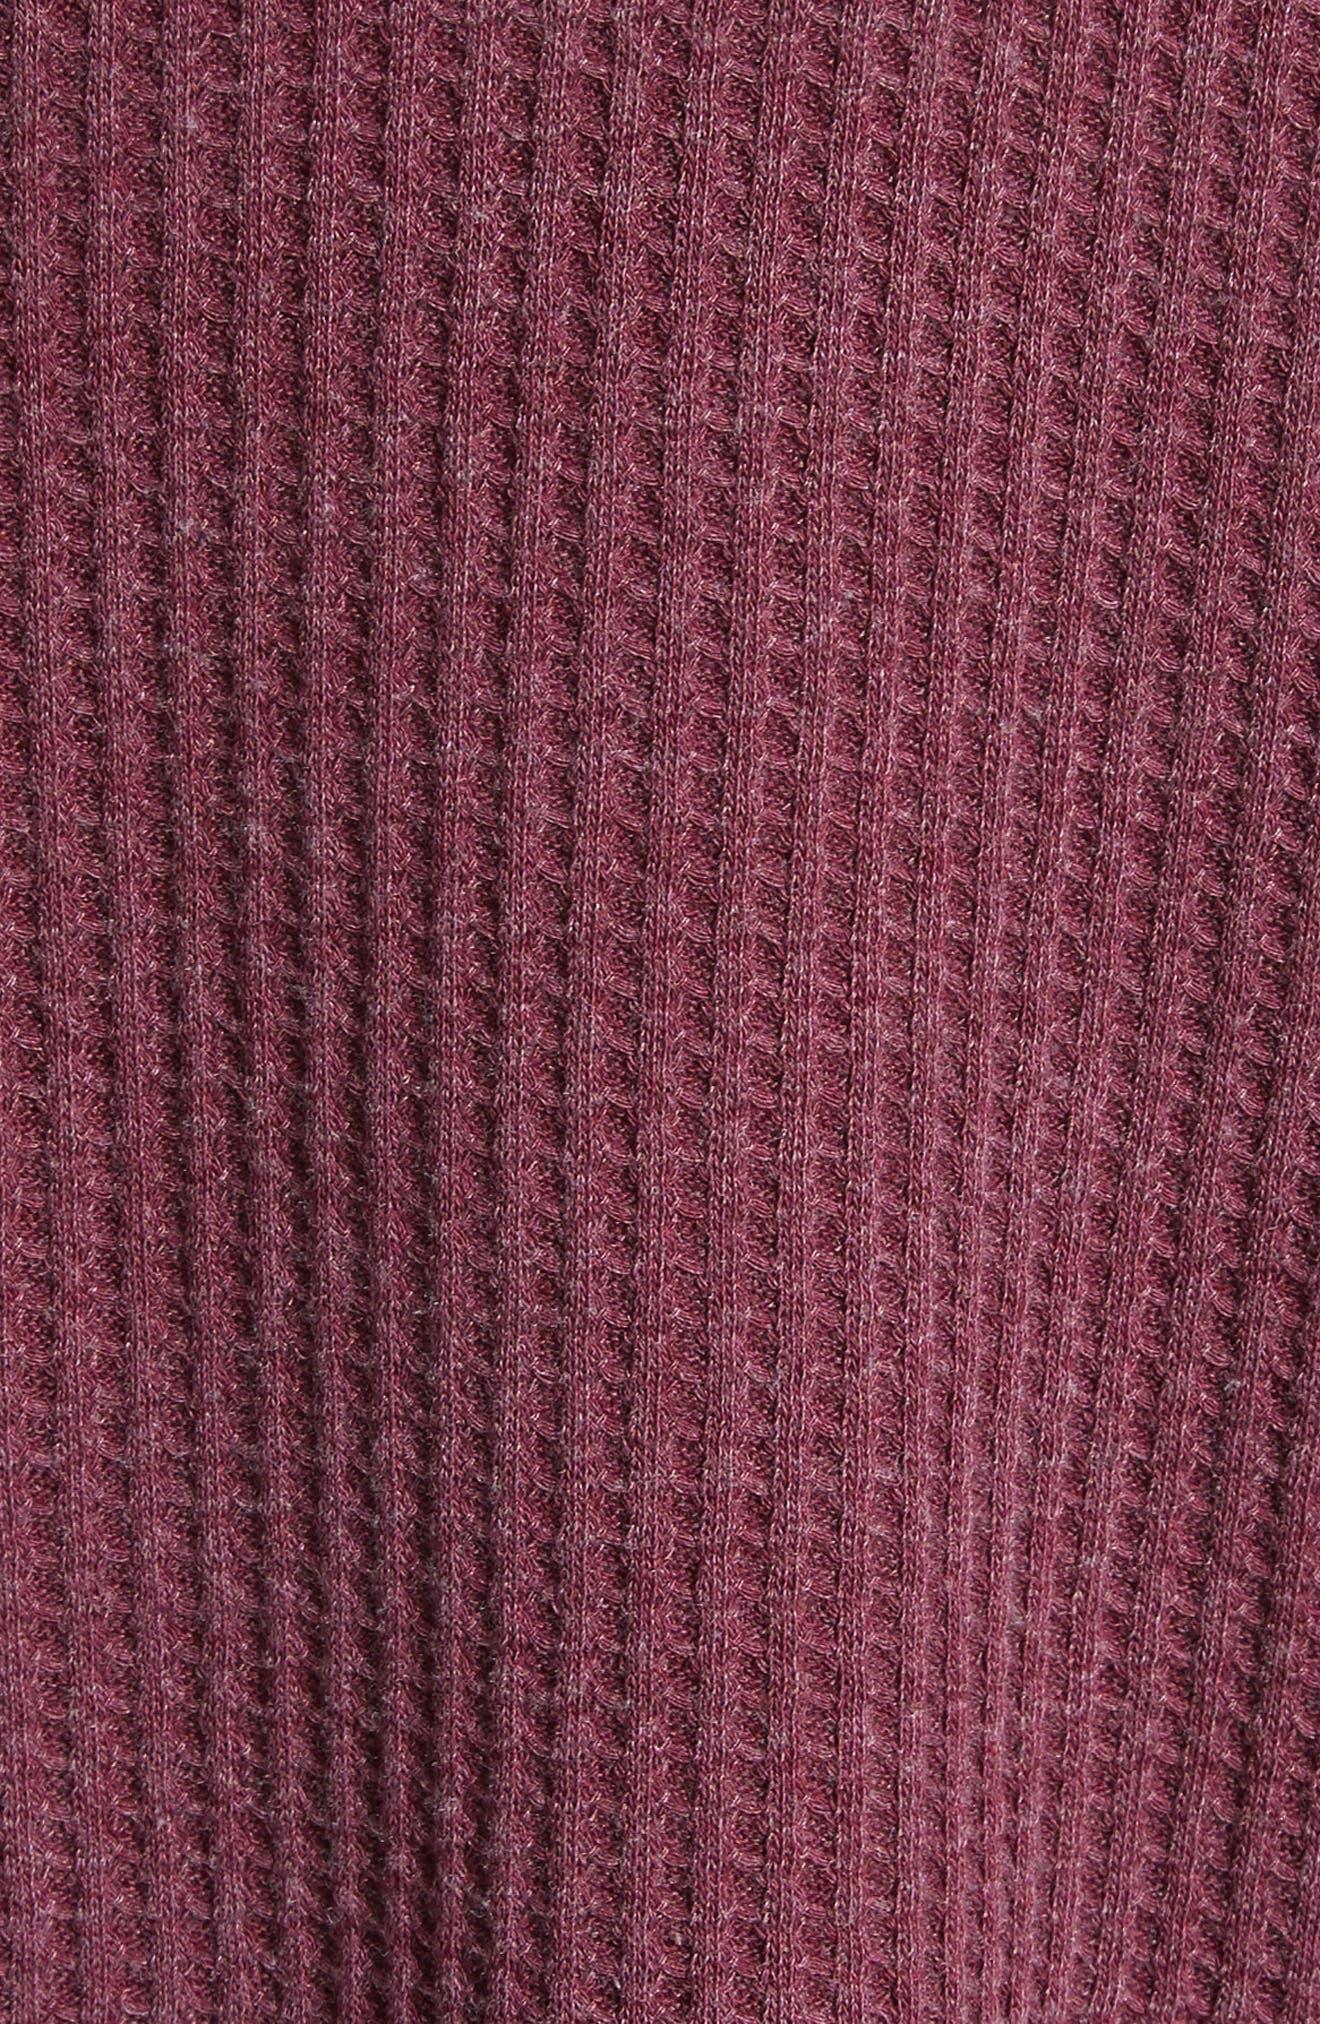 Dahlia Thermal Top,                             Alternate thumbnail 6, color,                             Wine